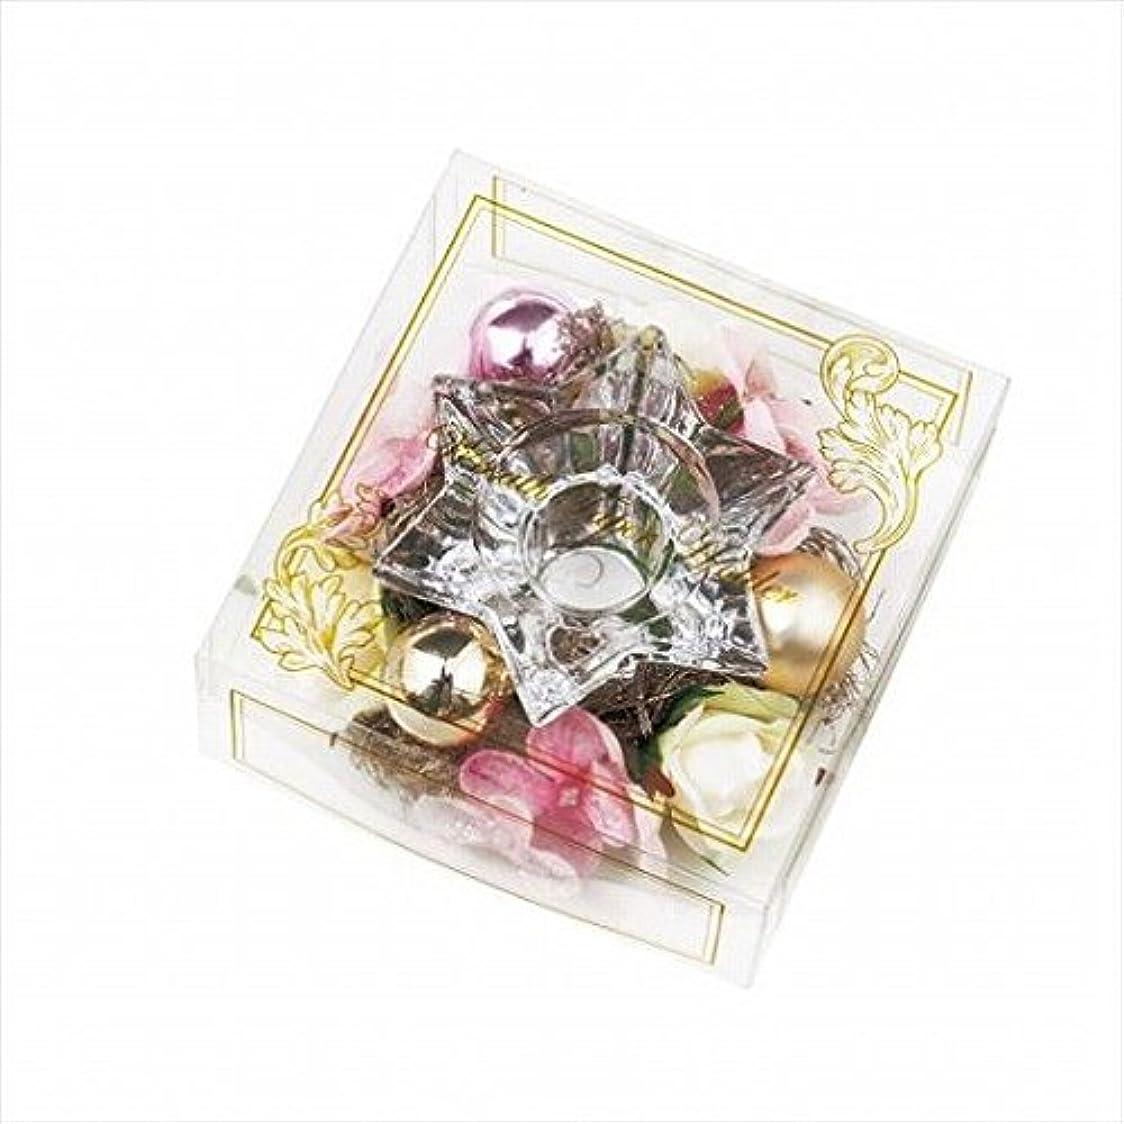 kameyama candle(カメヤマキャンドル) リーステーパーホルダー 「 ソフトピンク 」(J0730000SP)